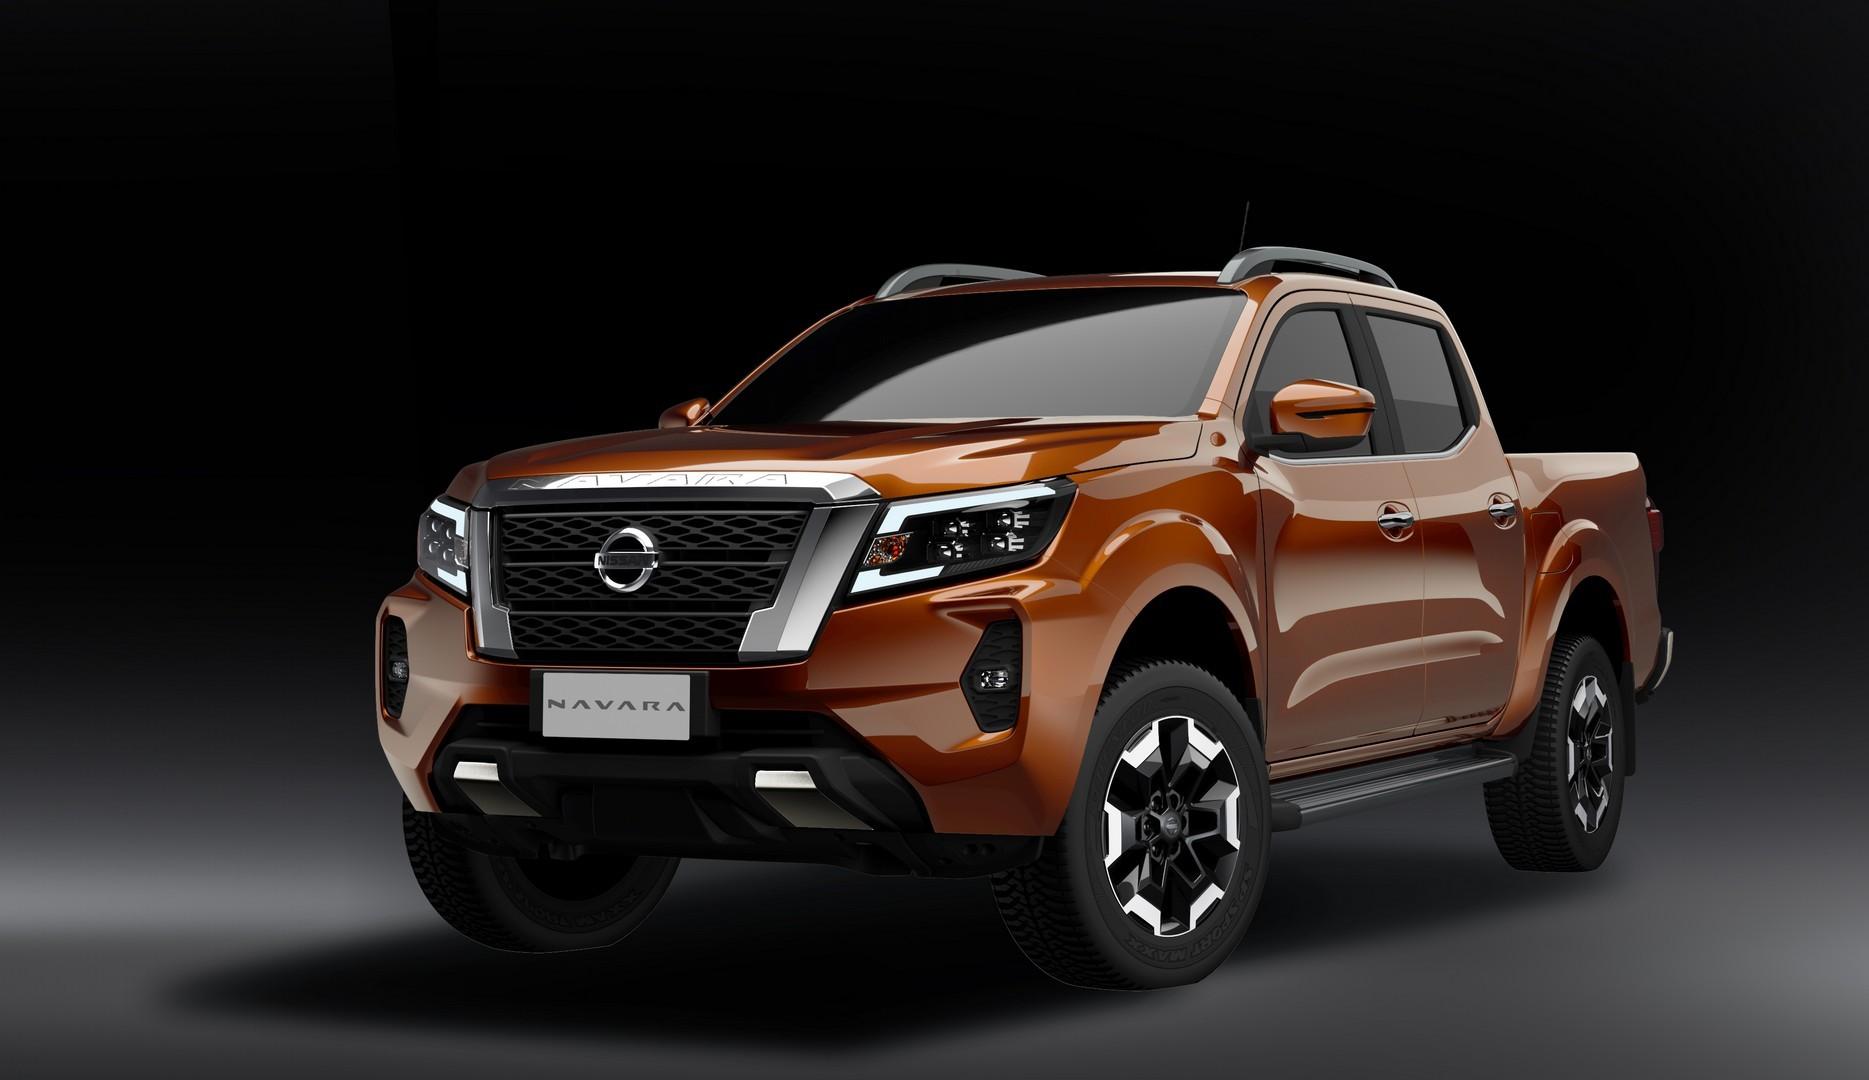 Nissan-Navara-2021-facelift-9